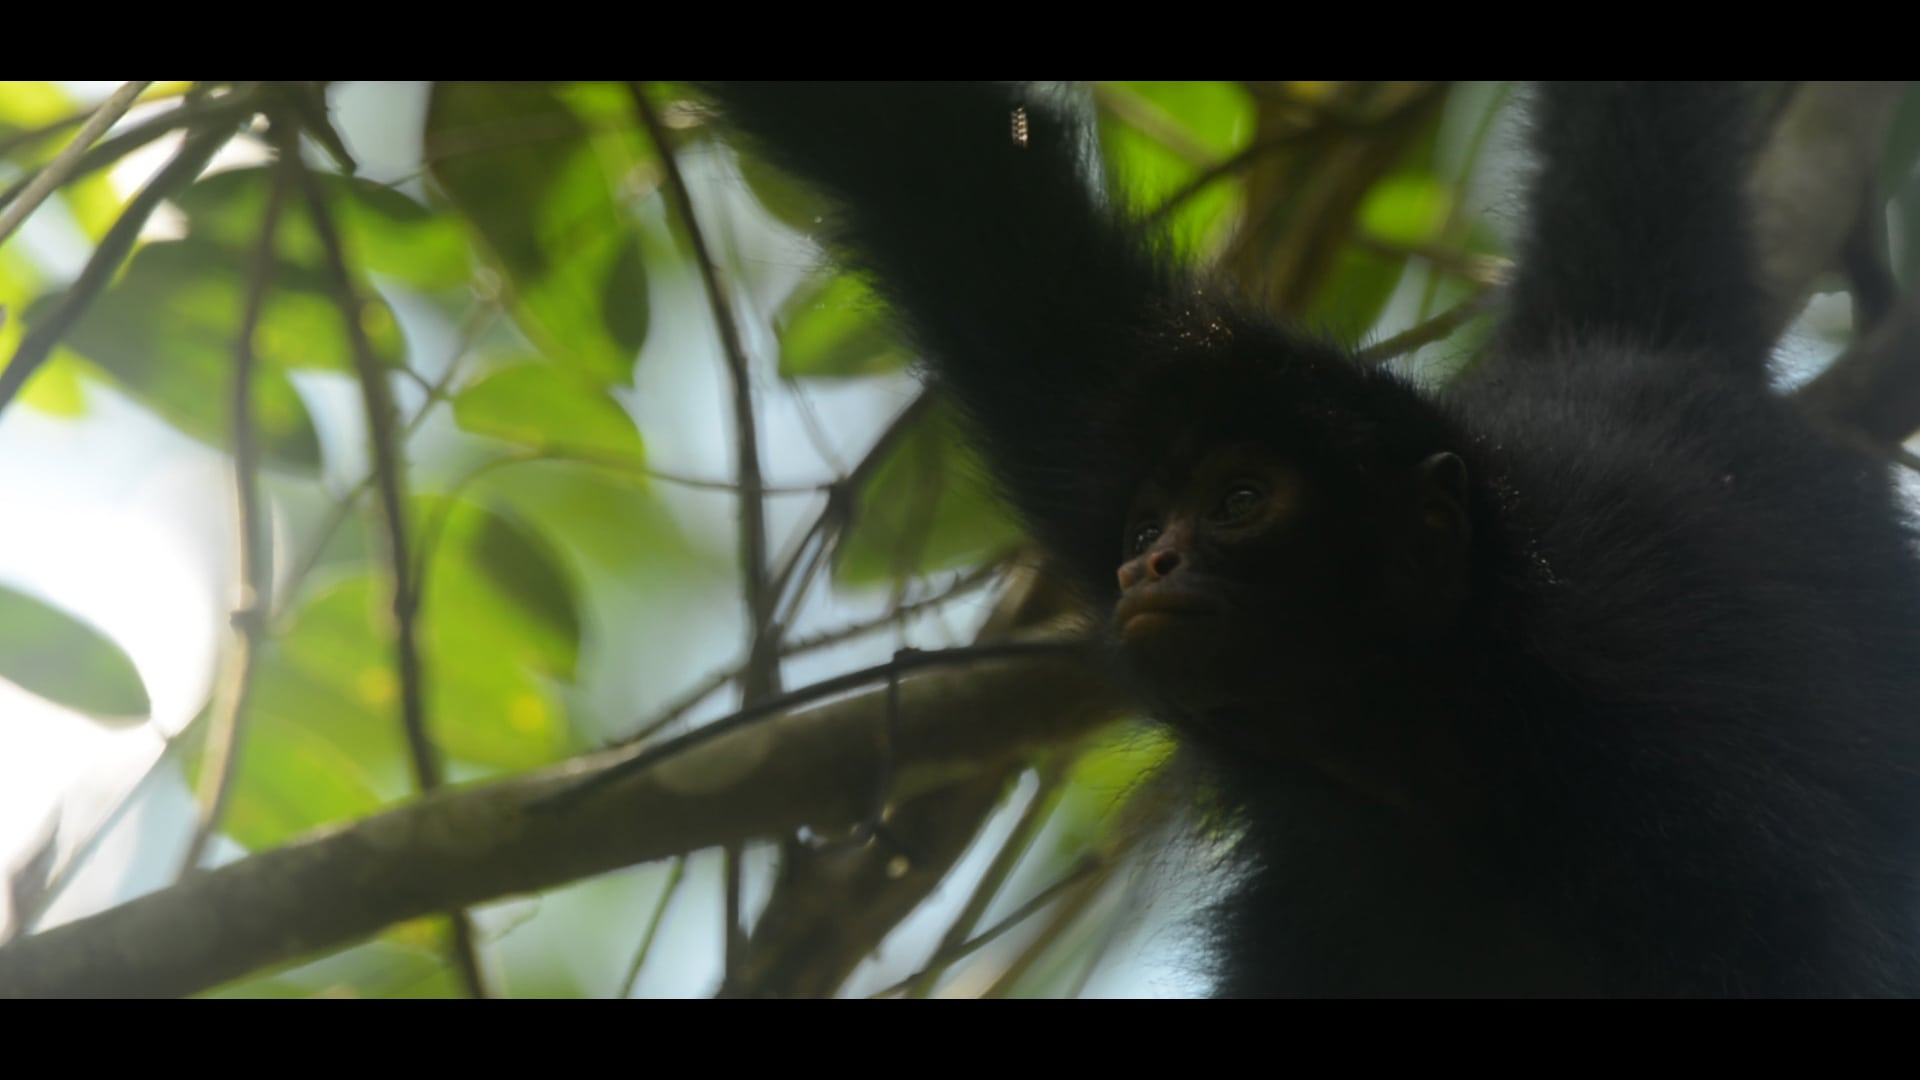 spider-monkey-eilidh-munro-crees-foundation